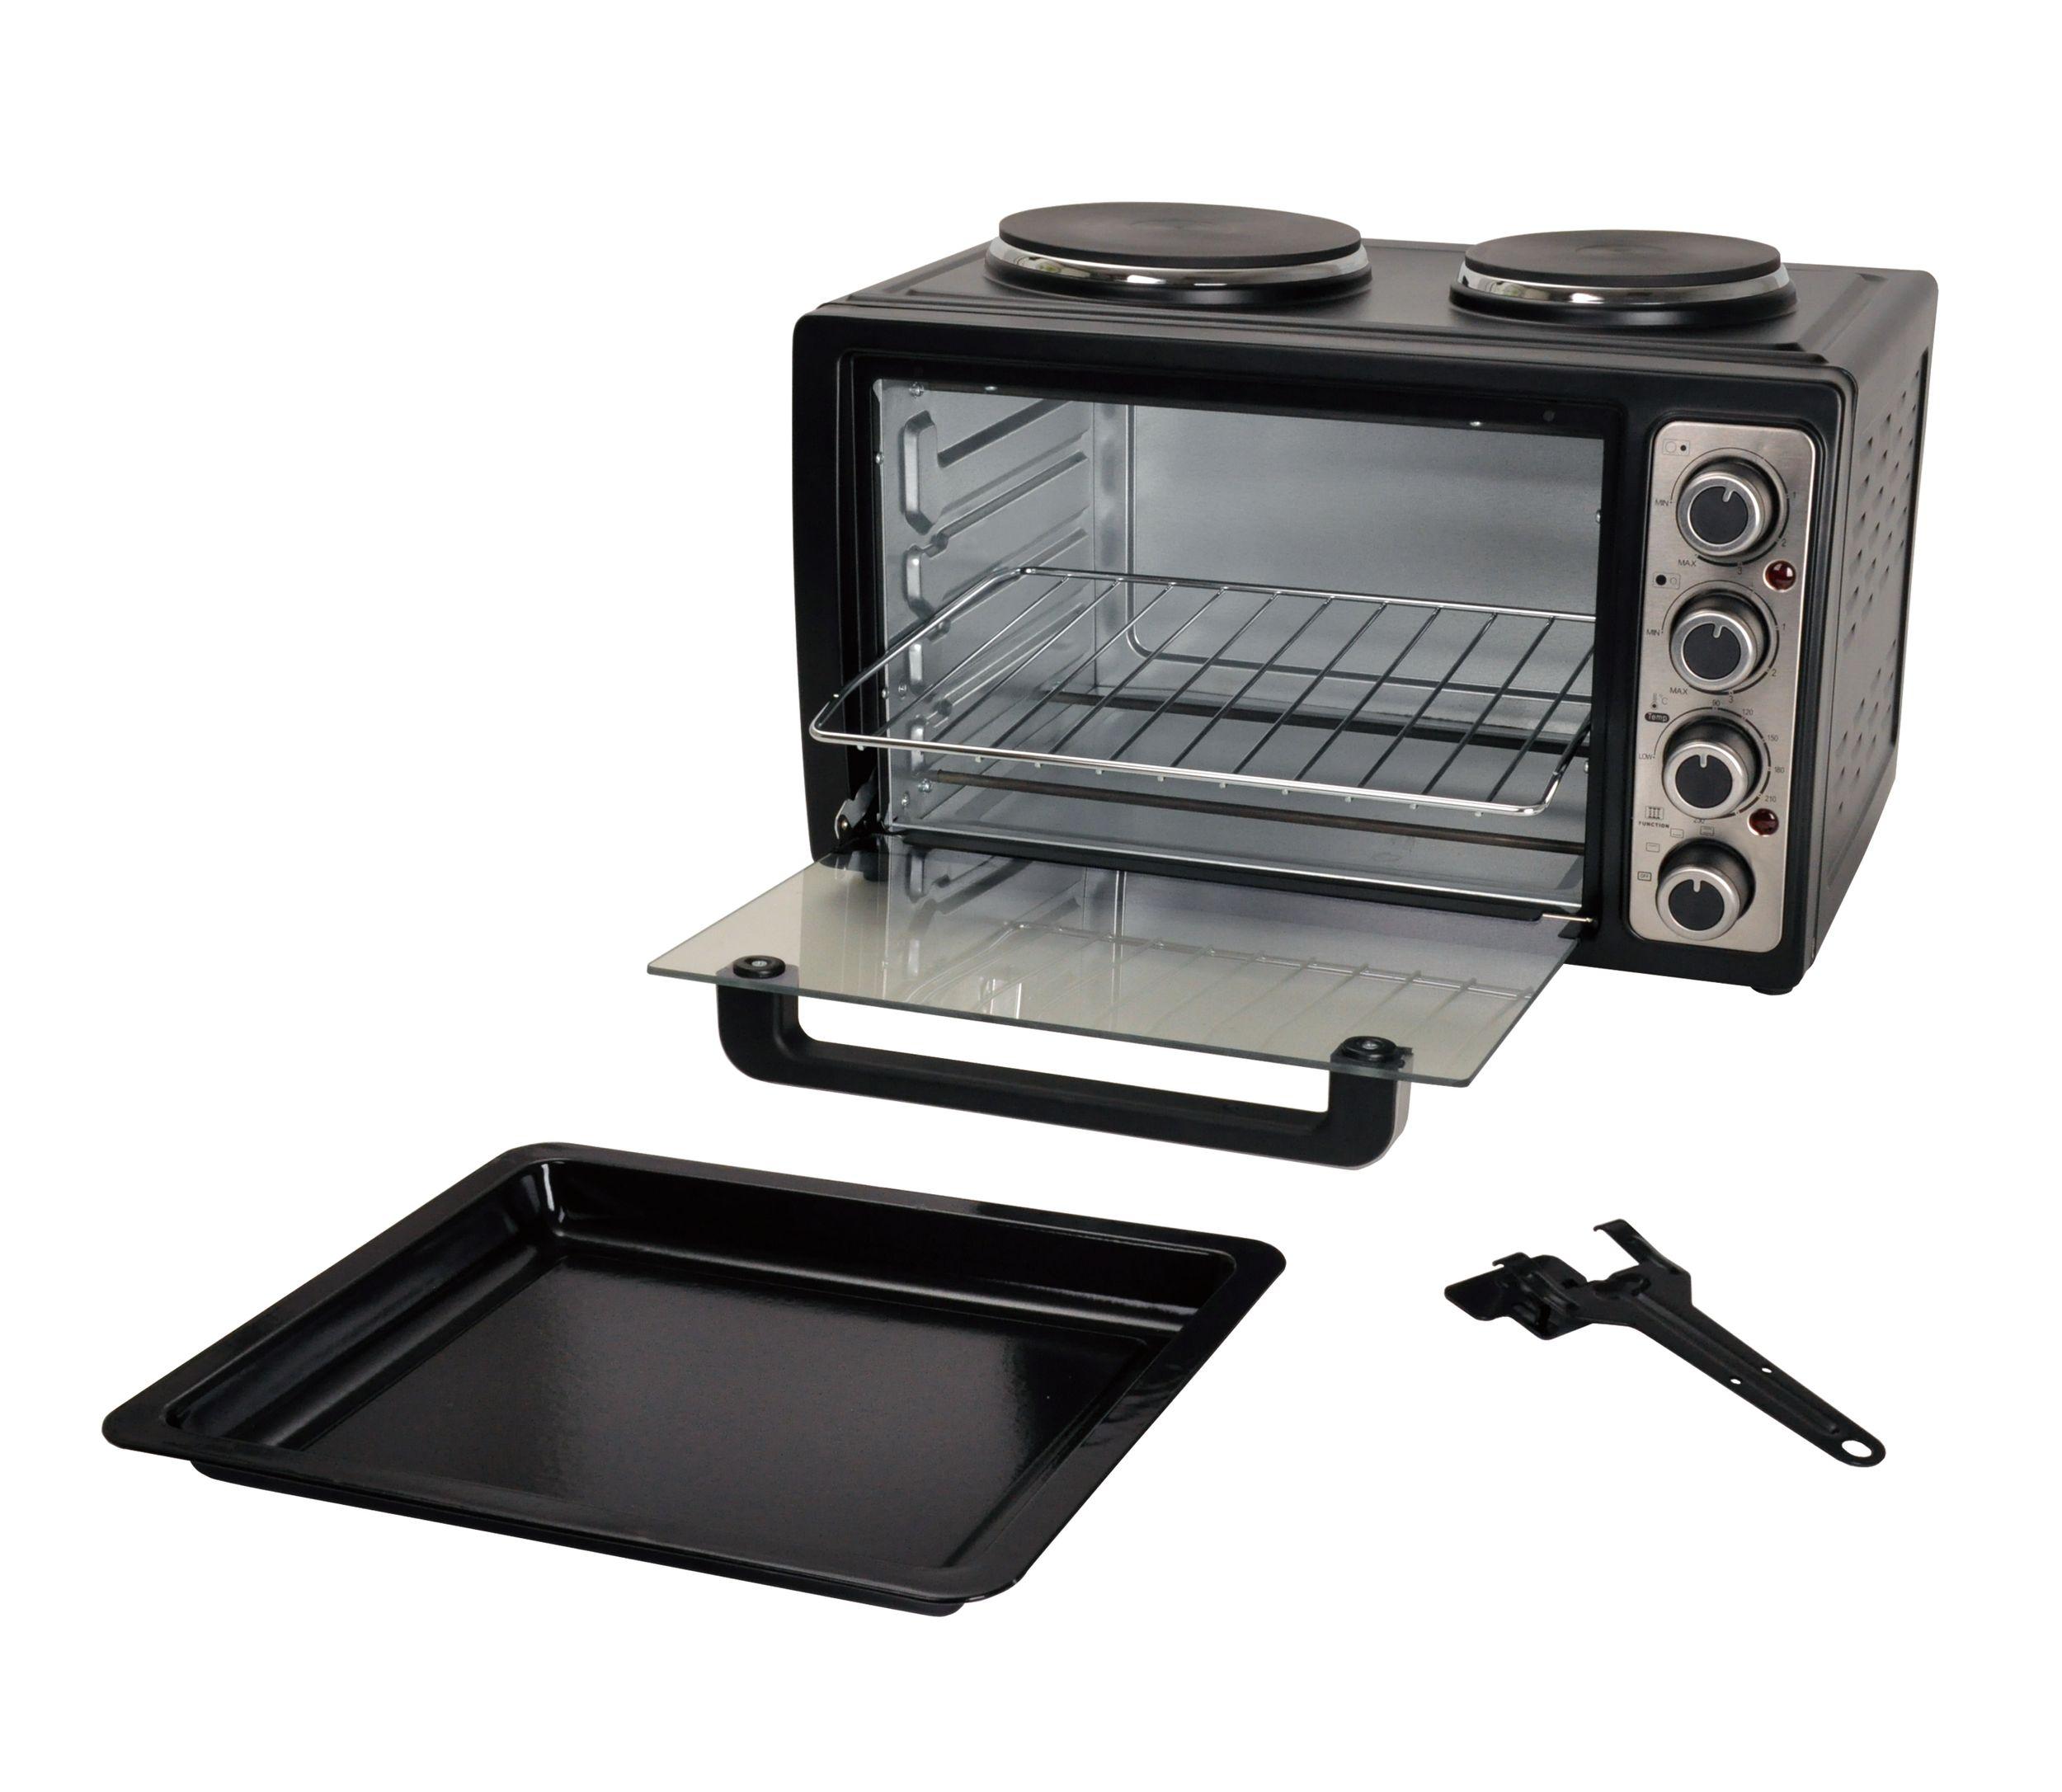 Kleinküche Backofen Kochplatten Miniofen 28Liter Doppelkochplatte NEU*34923 Bild 4